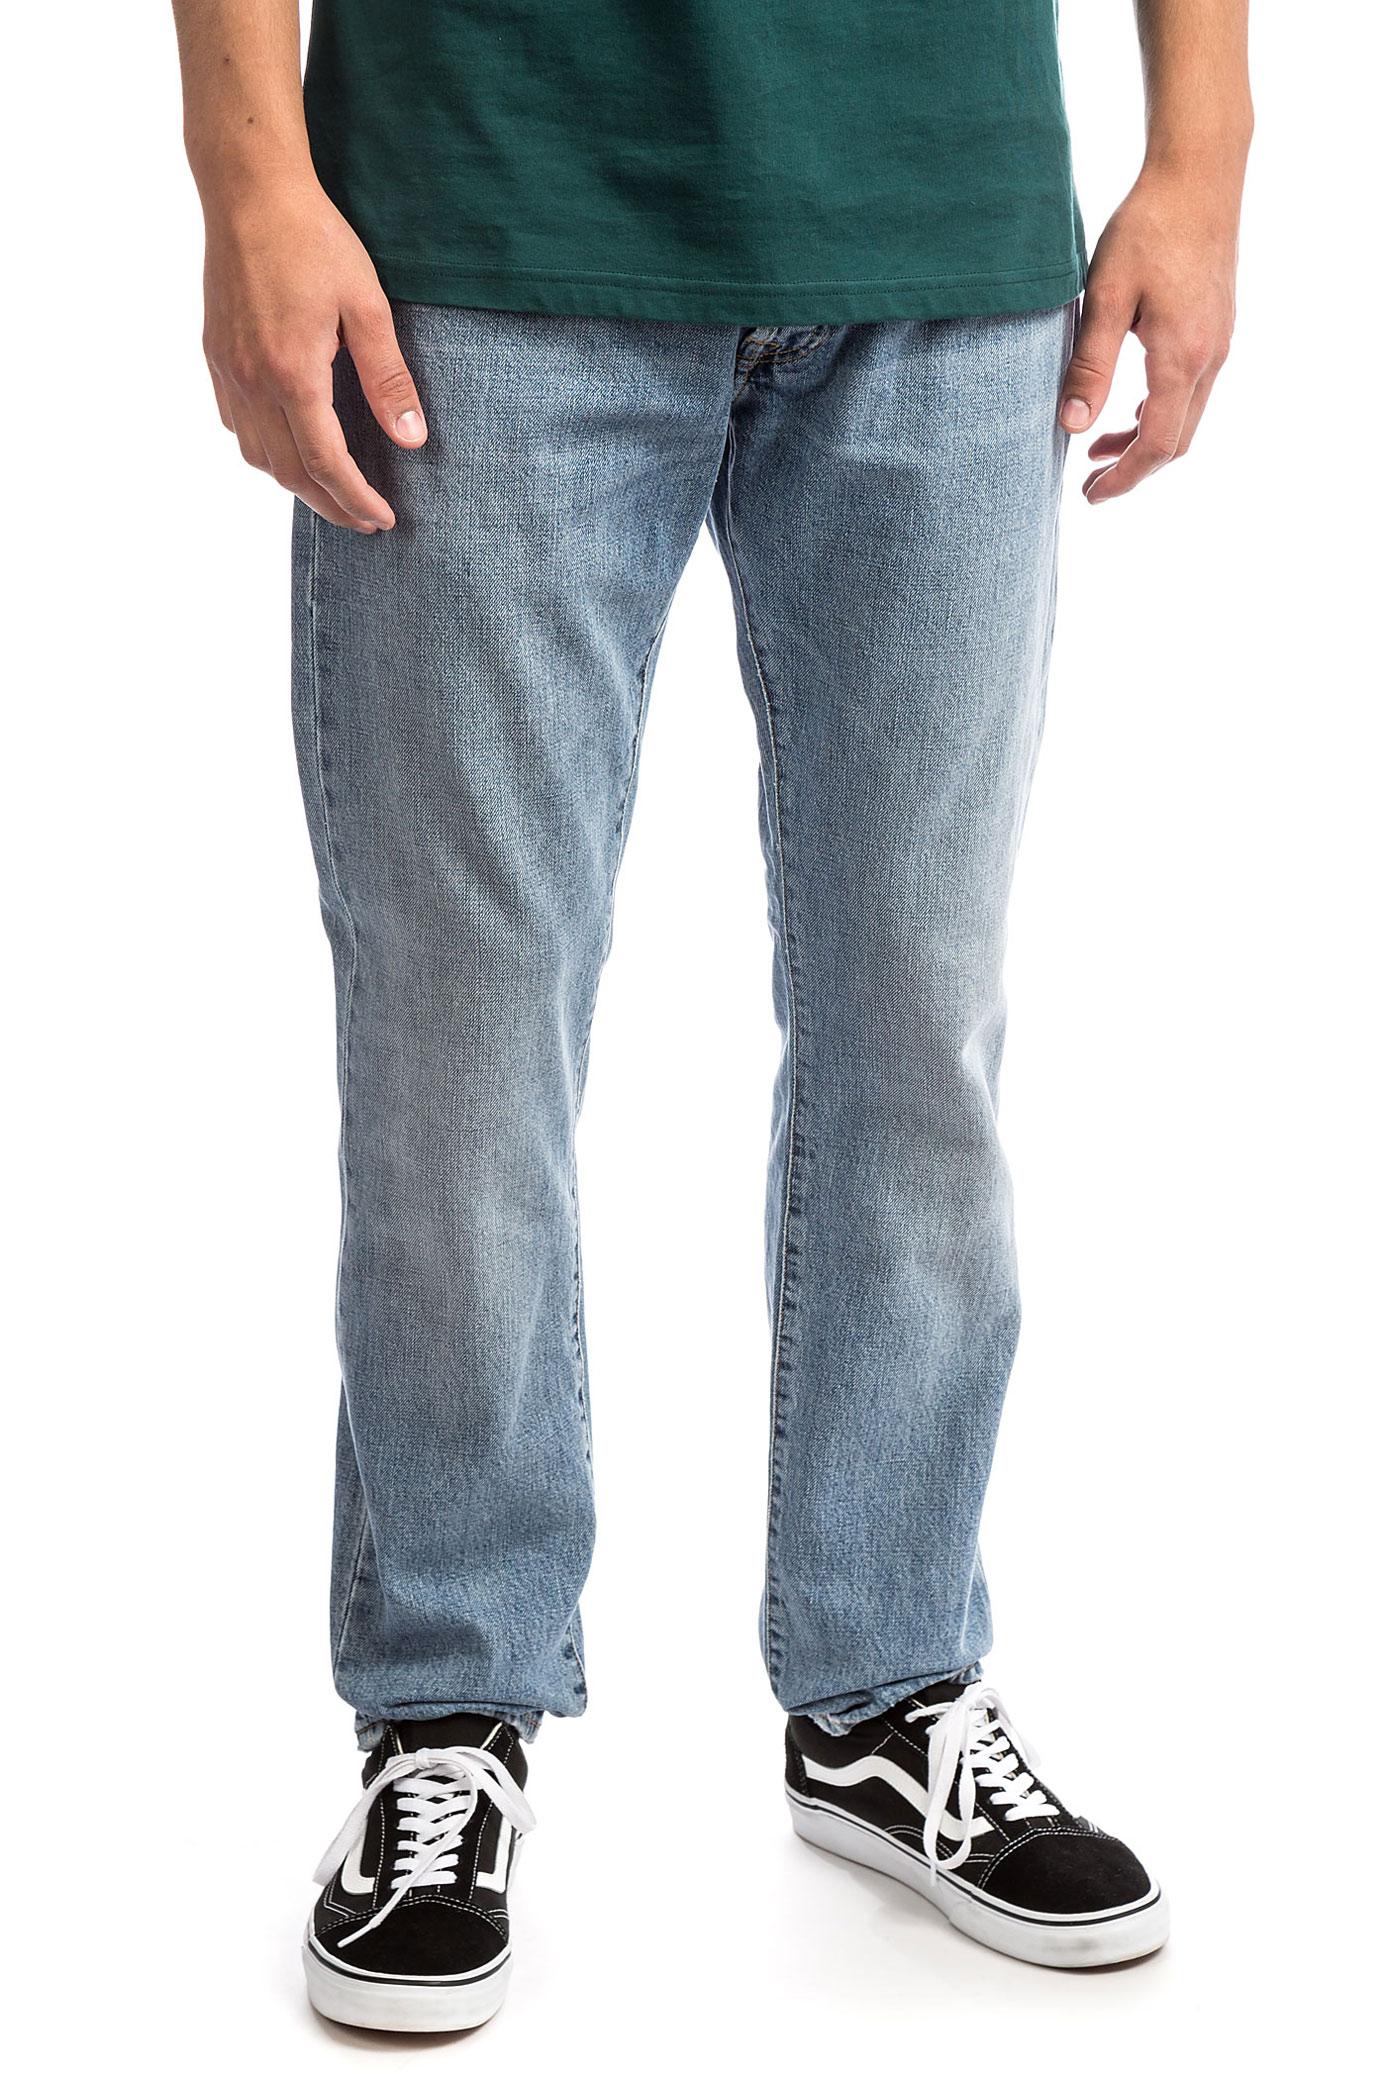 Pant Klondike Jeansblue Bleached Wip Edgewood Coast Carhartt hdQrsxtC